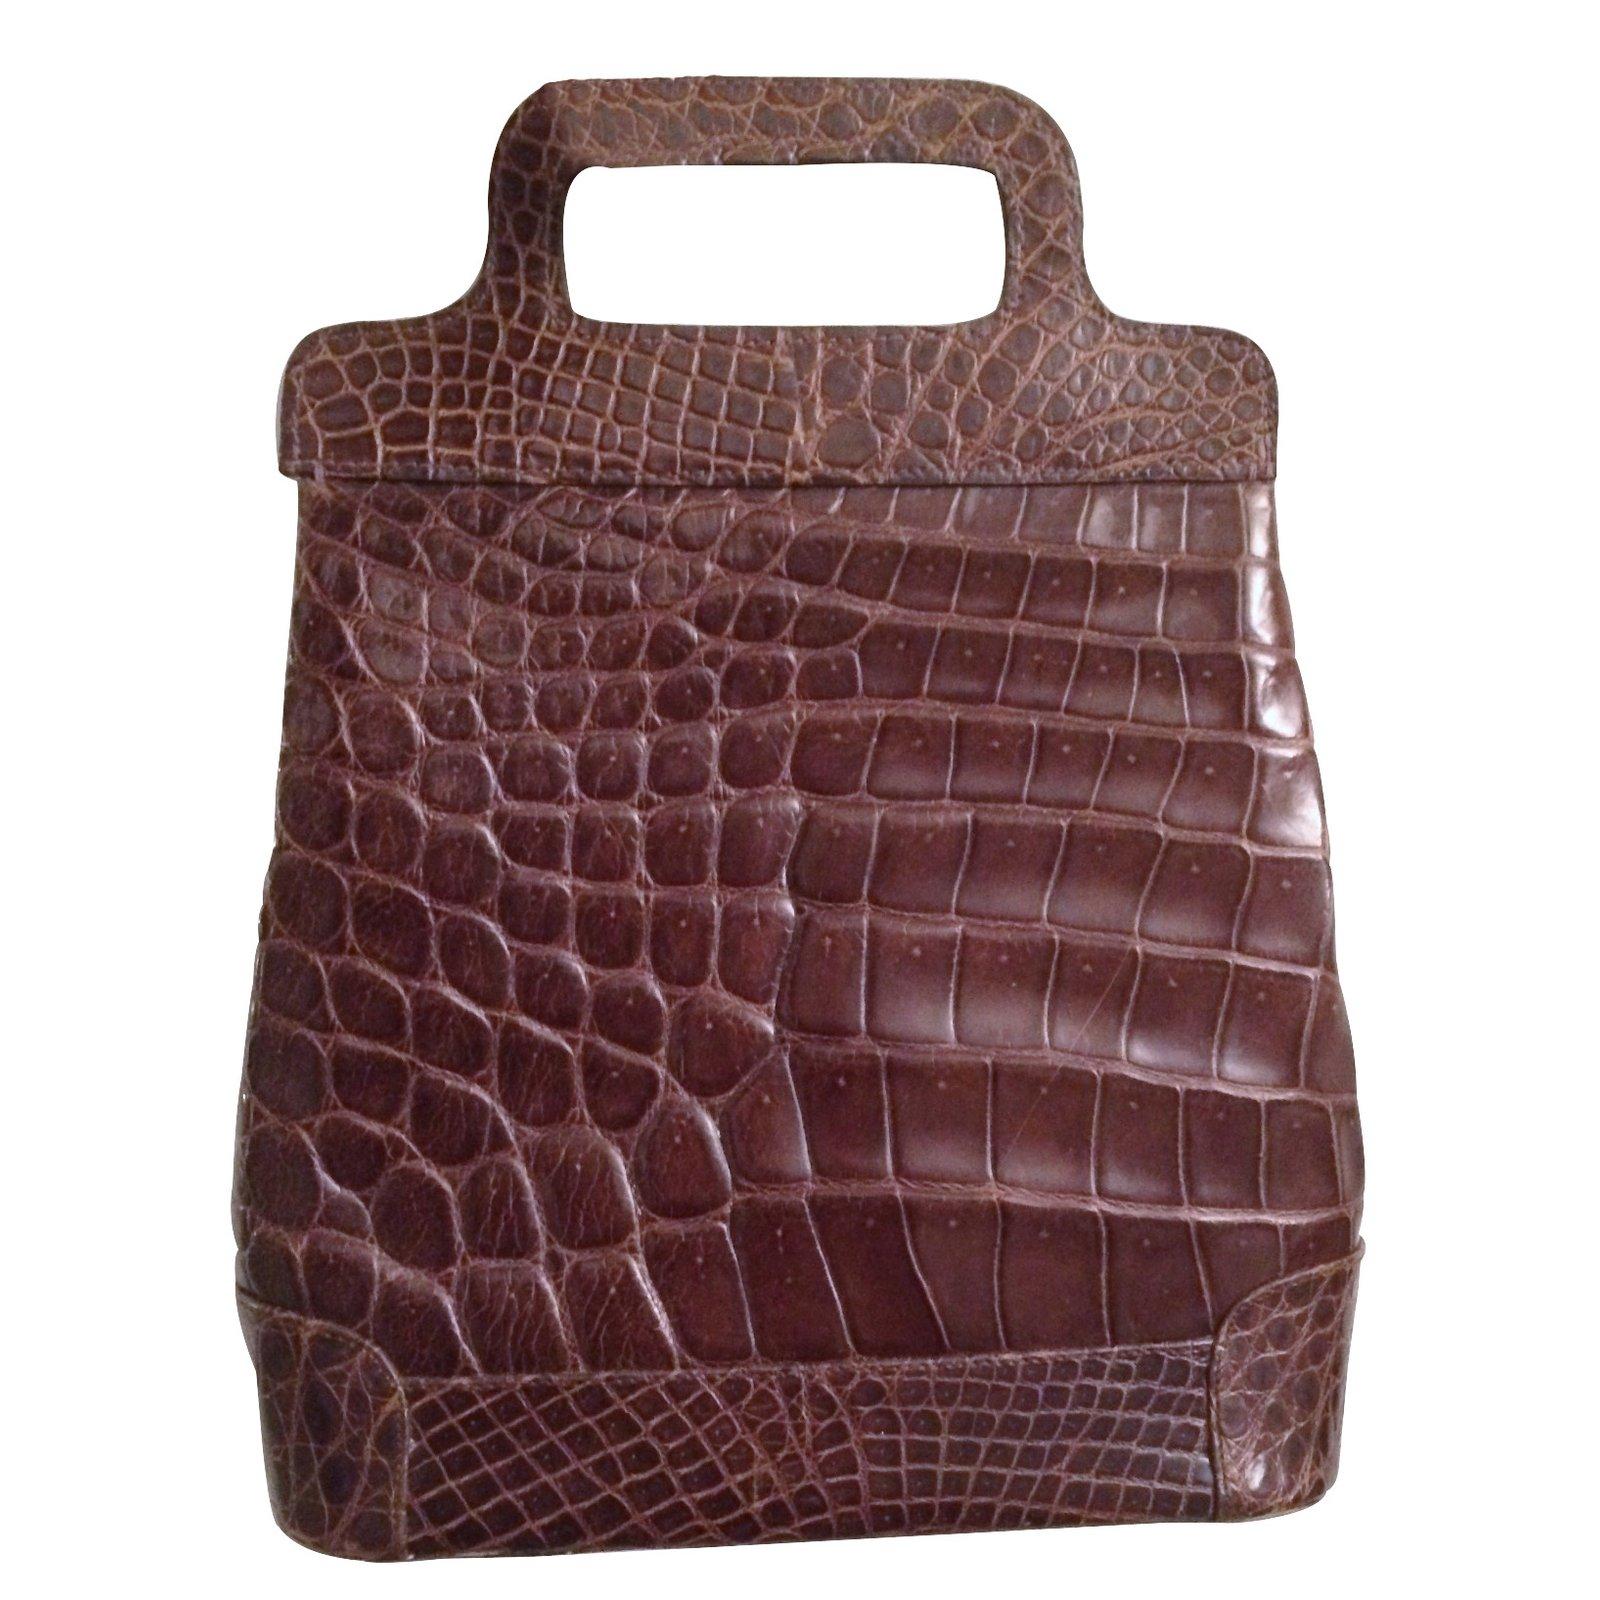 sacs main autre marque sac vintage crocodile cuirs exotiques marron joli closet. Black Bedroom Furniture Sets. Home Design Ideas